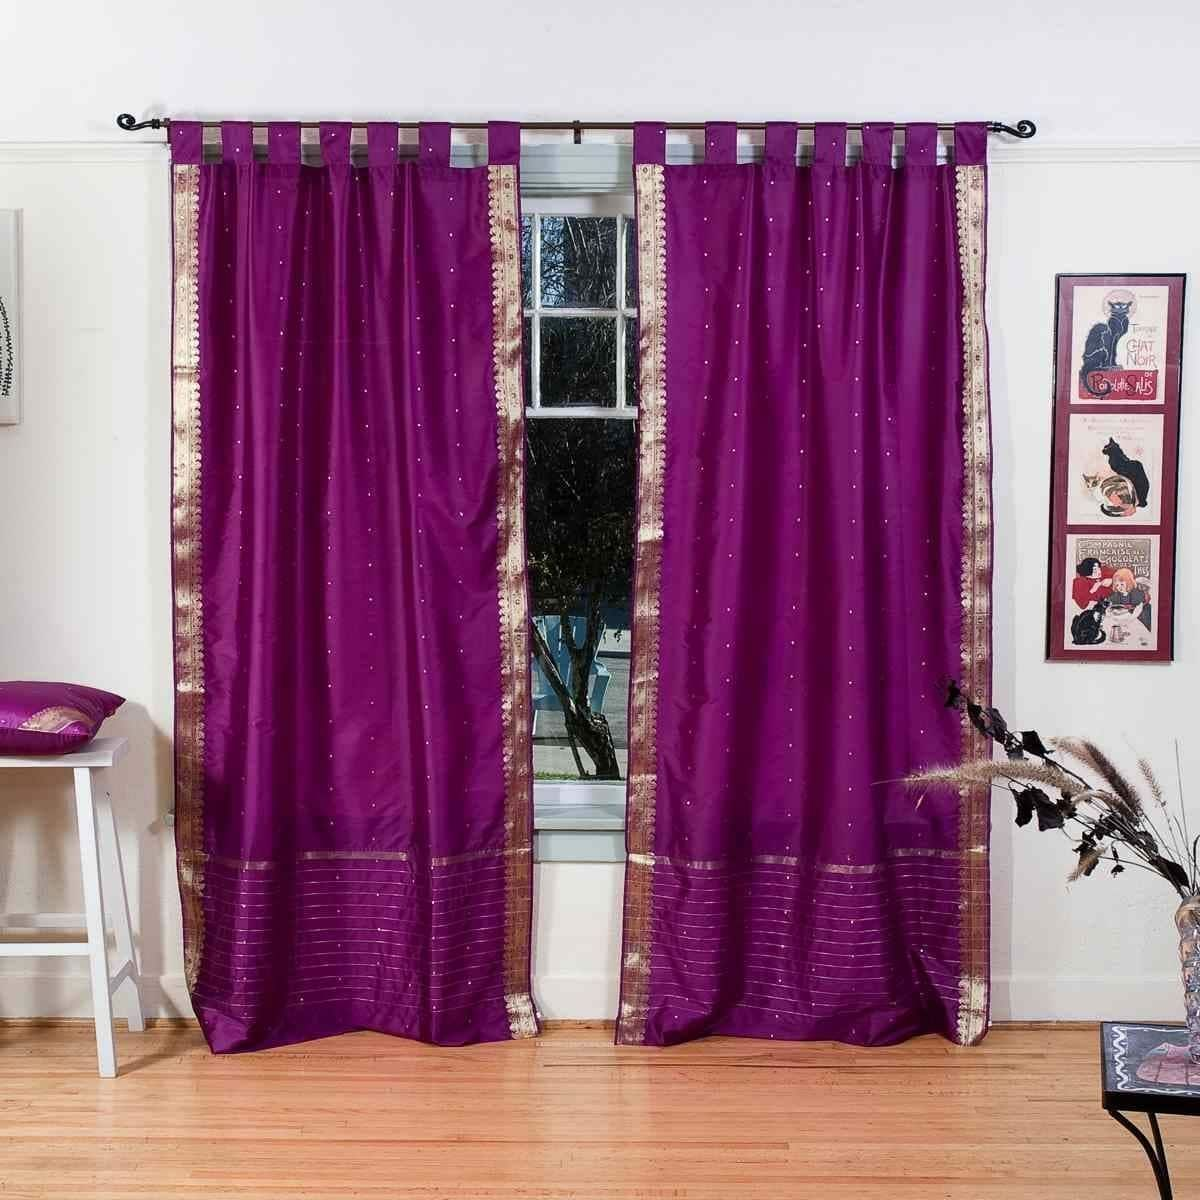 Indian Selections Violet Red Tab Top Sheer Sari Curtain Drape